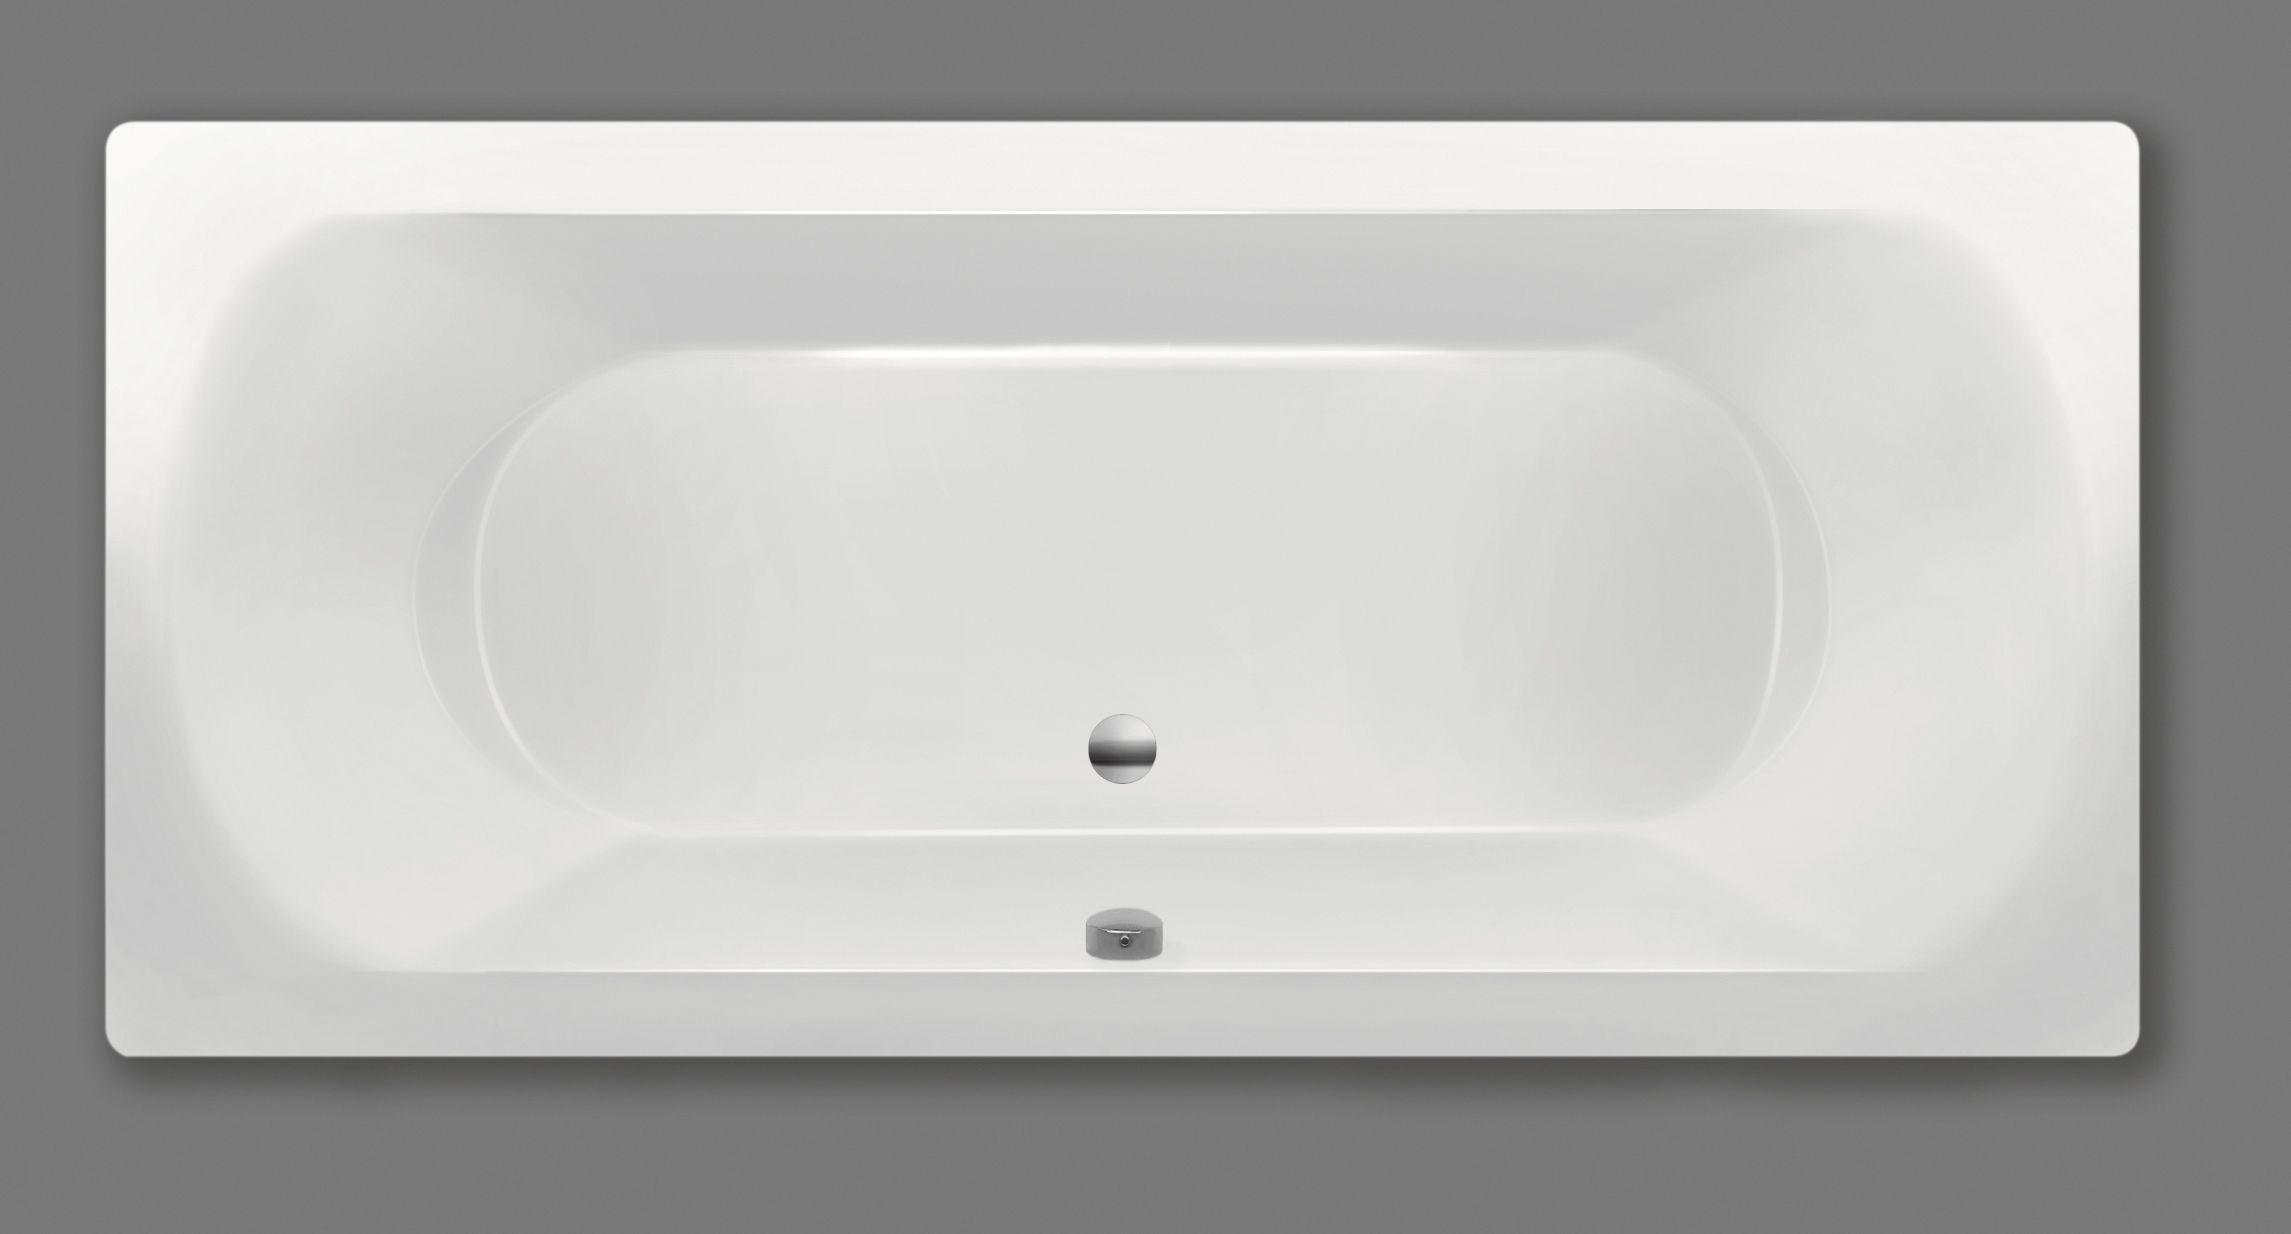 Xenz Lagoon badkuip 190x90x50cm créme